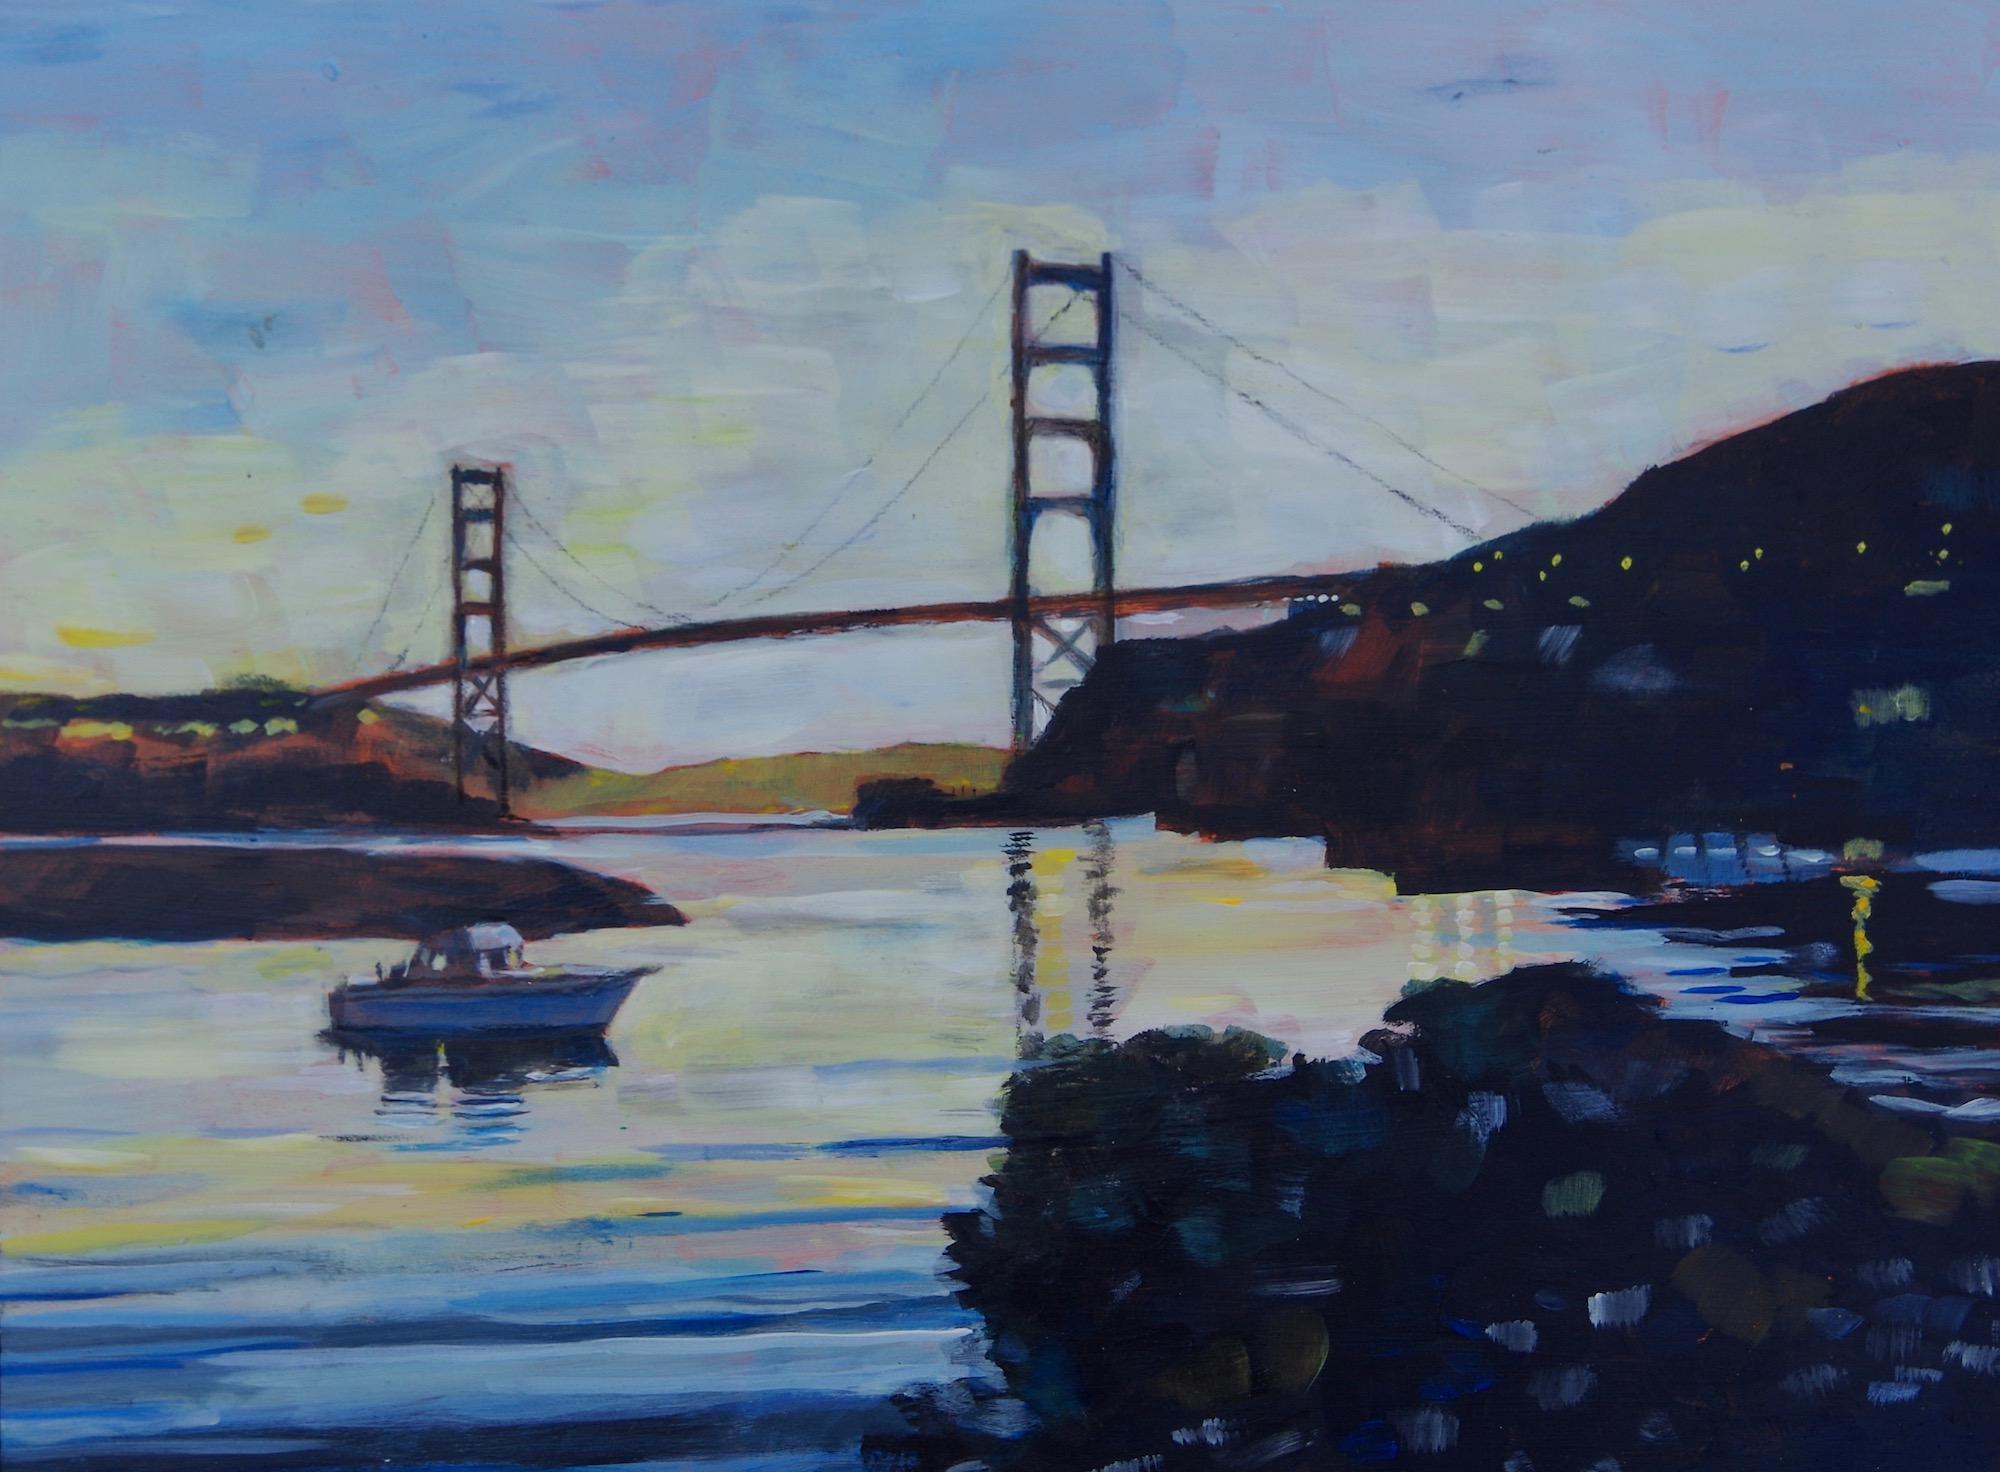 Golden Gate from Marina